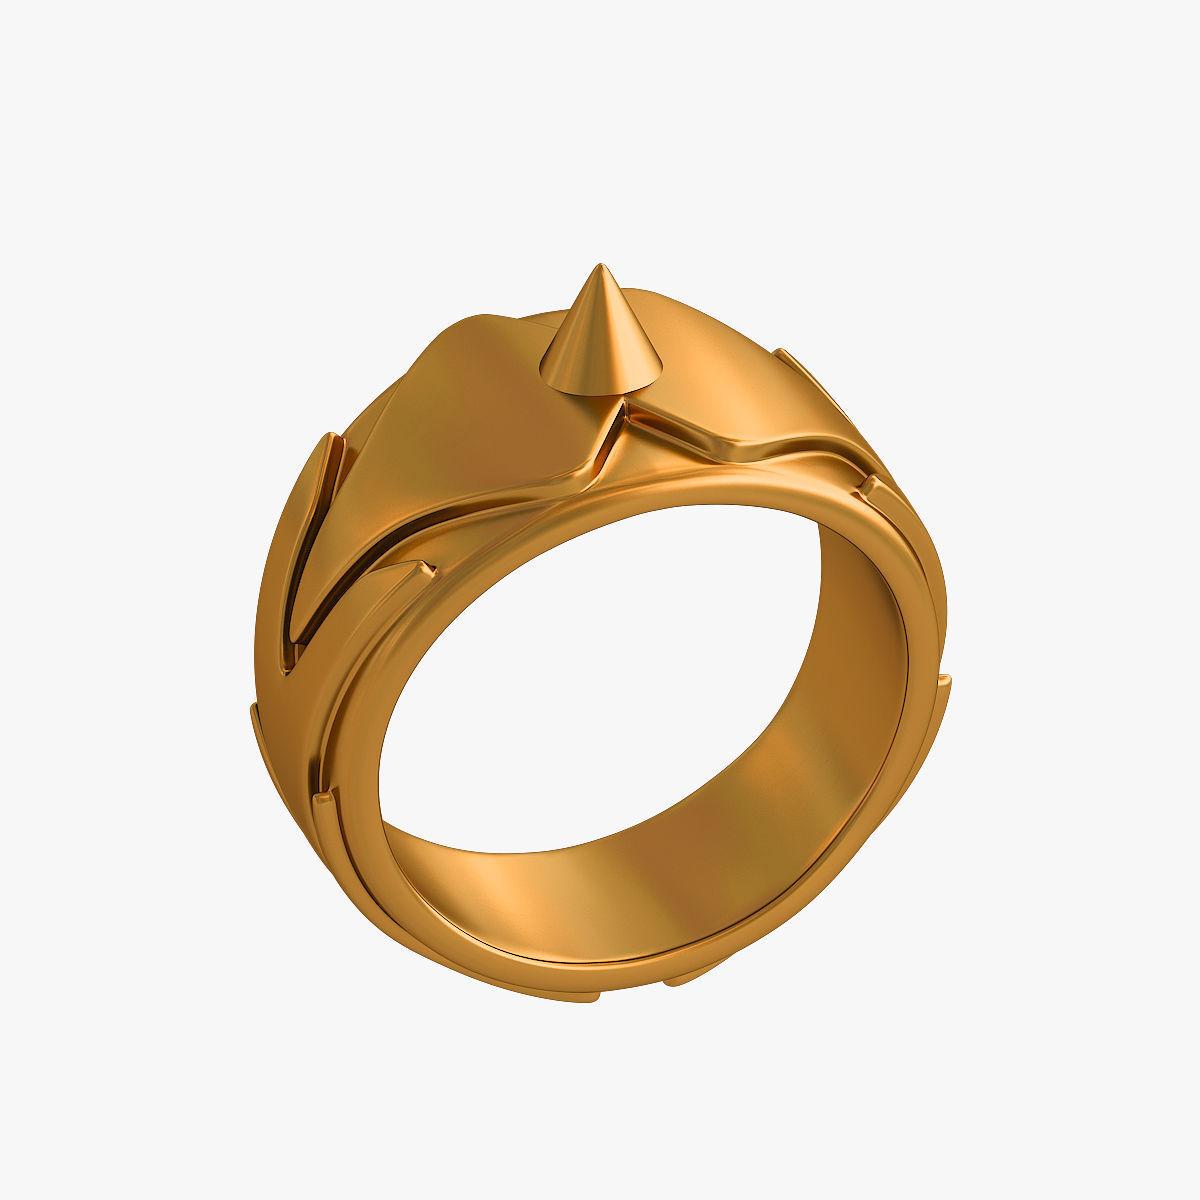 Self-defense ring